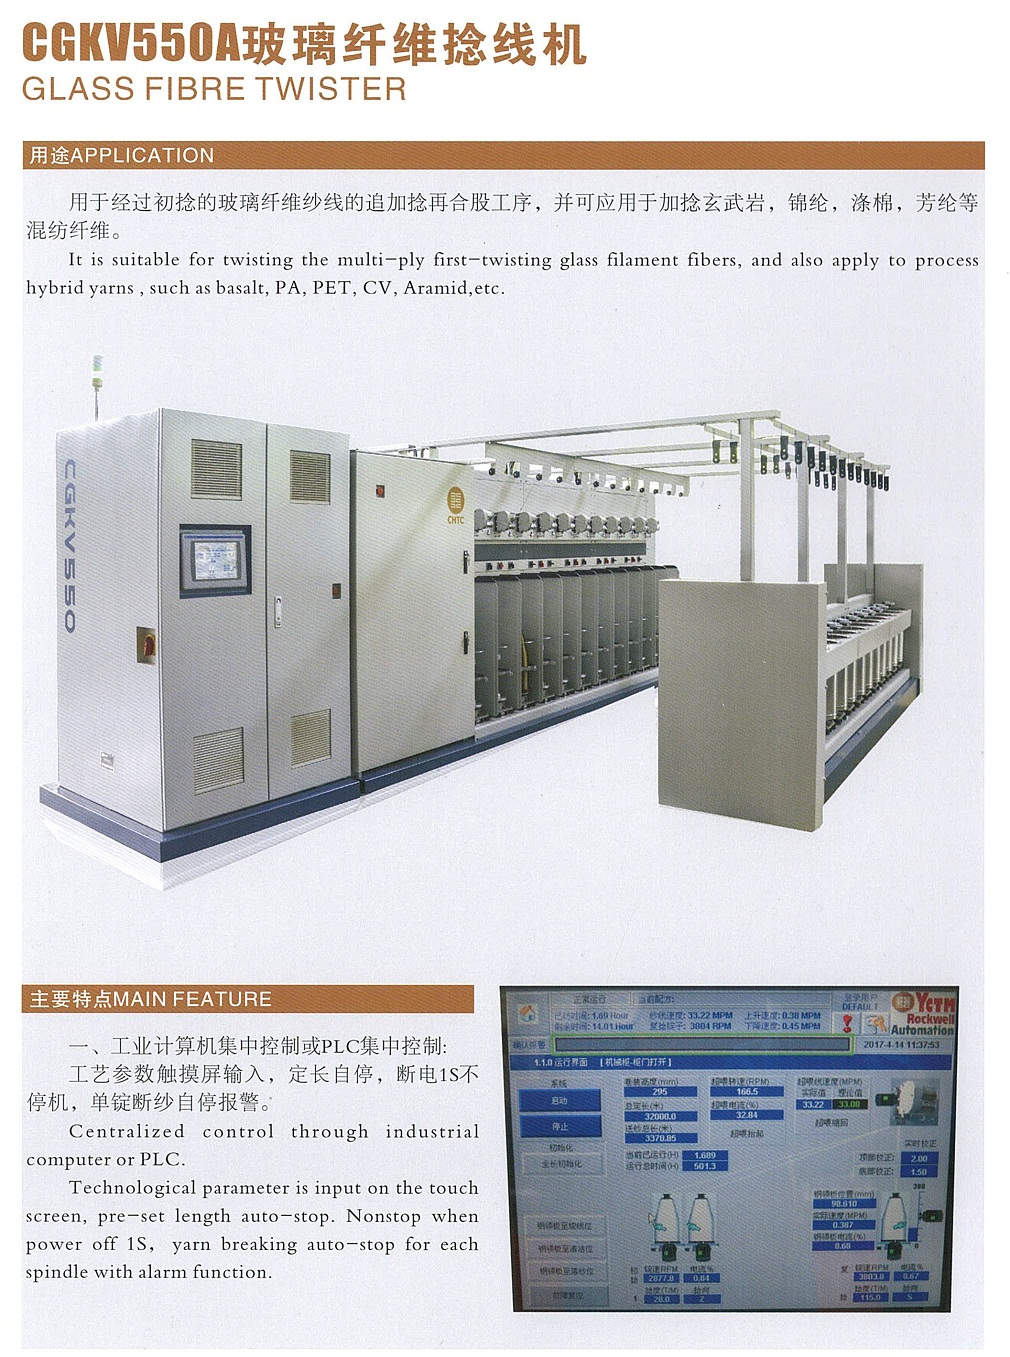 CGKV550A产品详情一